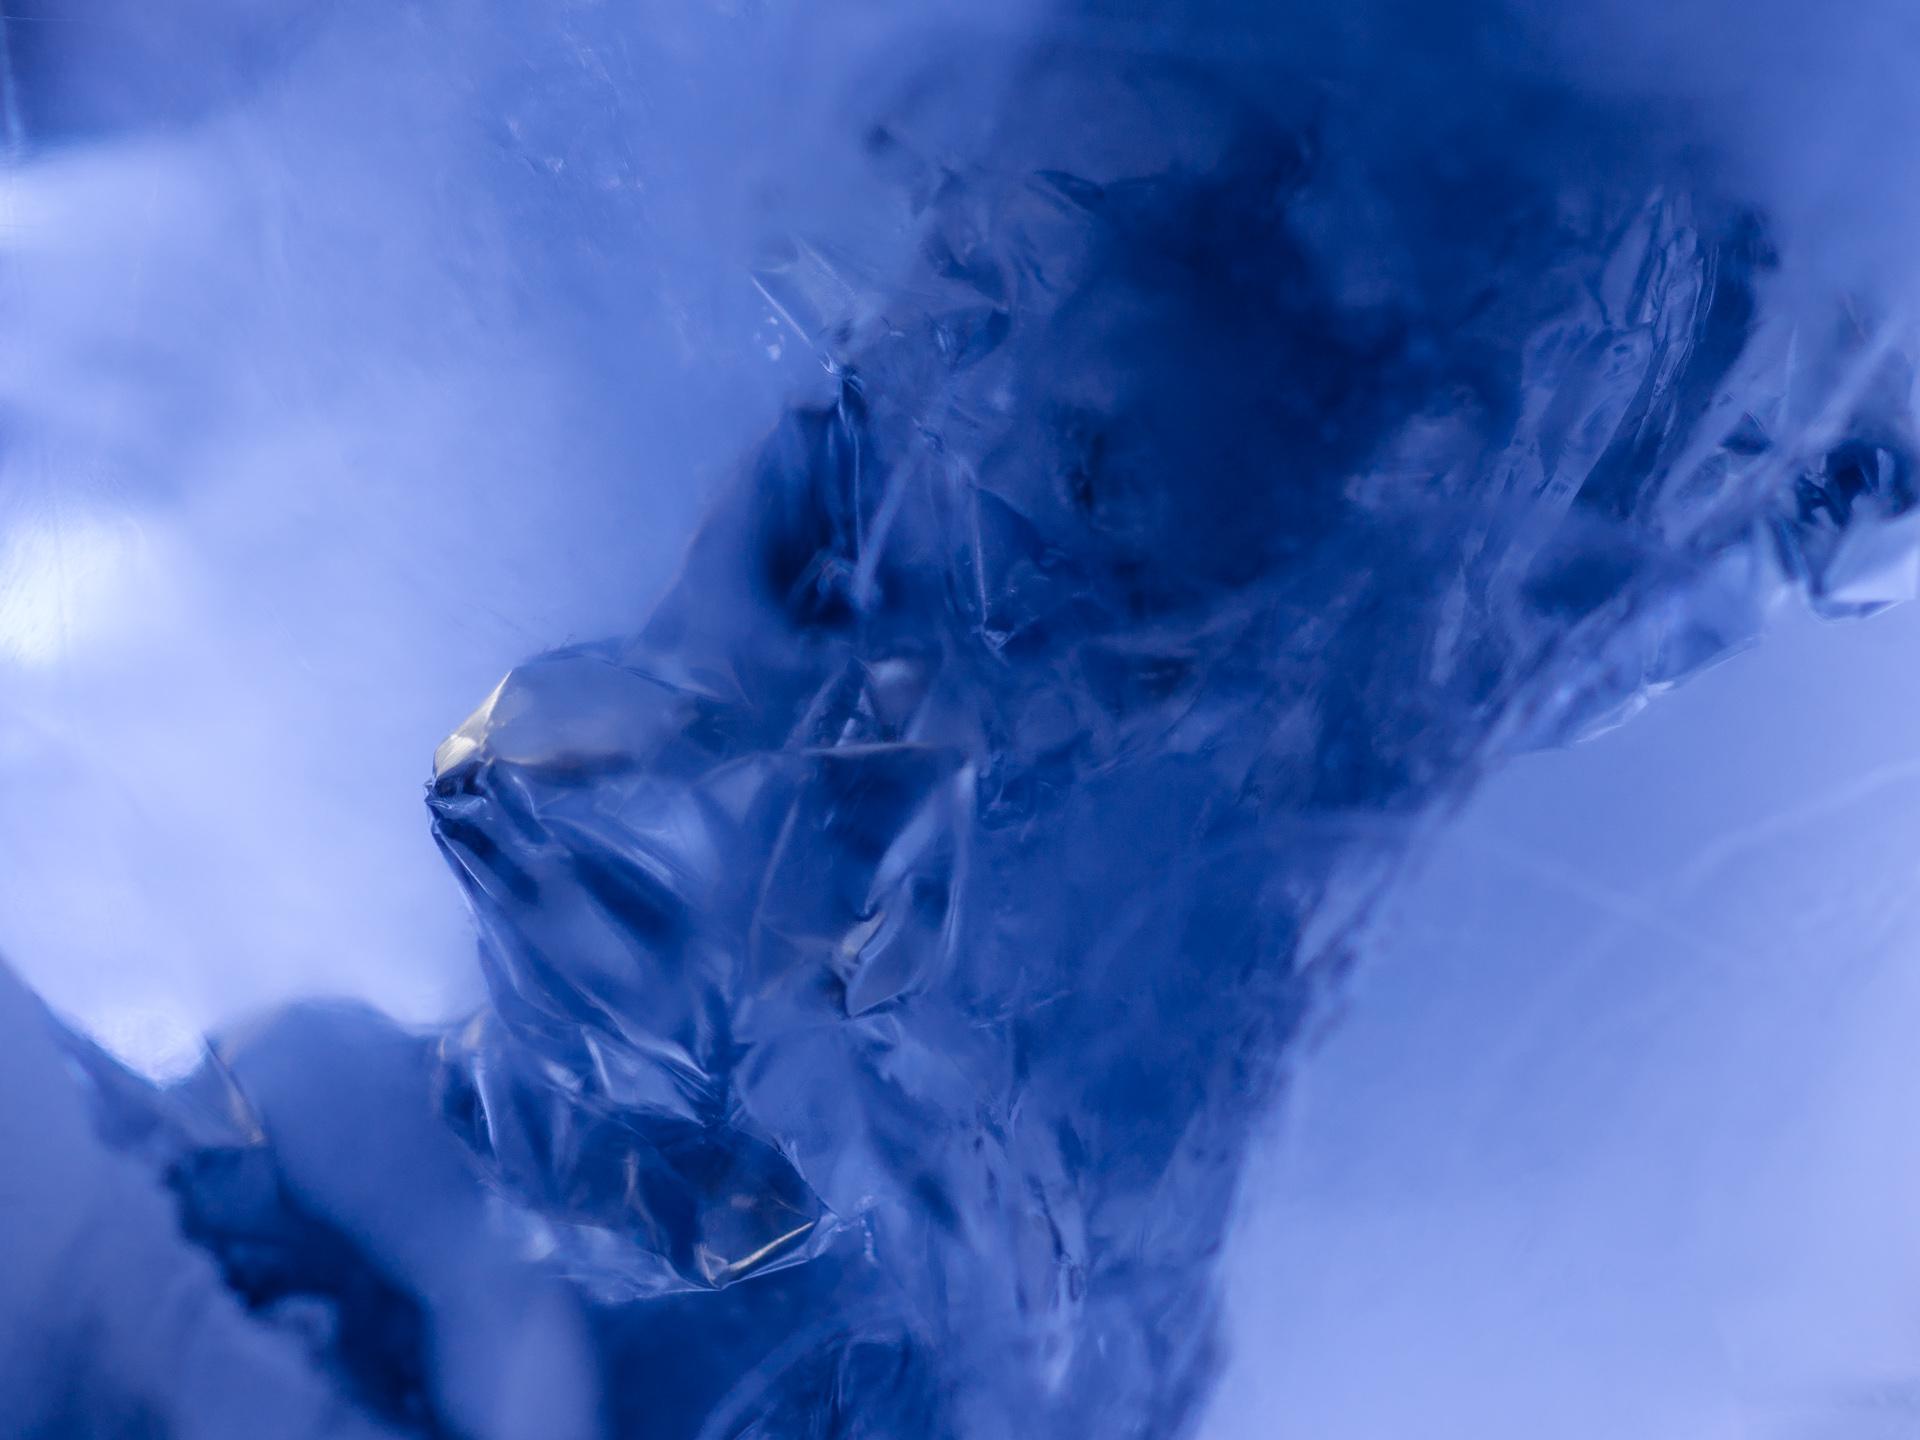 Eis-Abstraktions-Fotografie